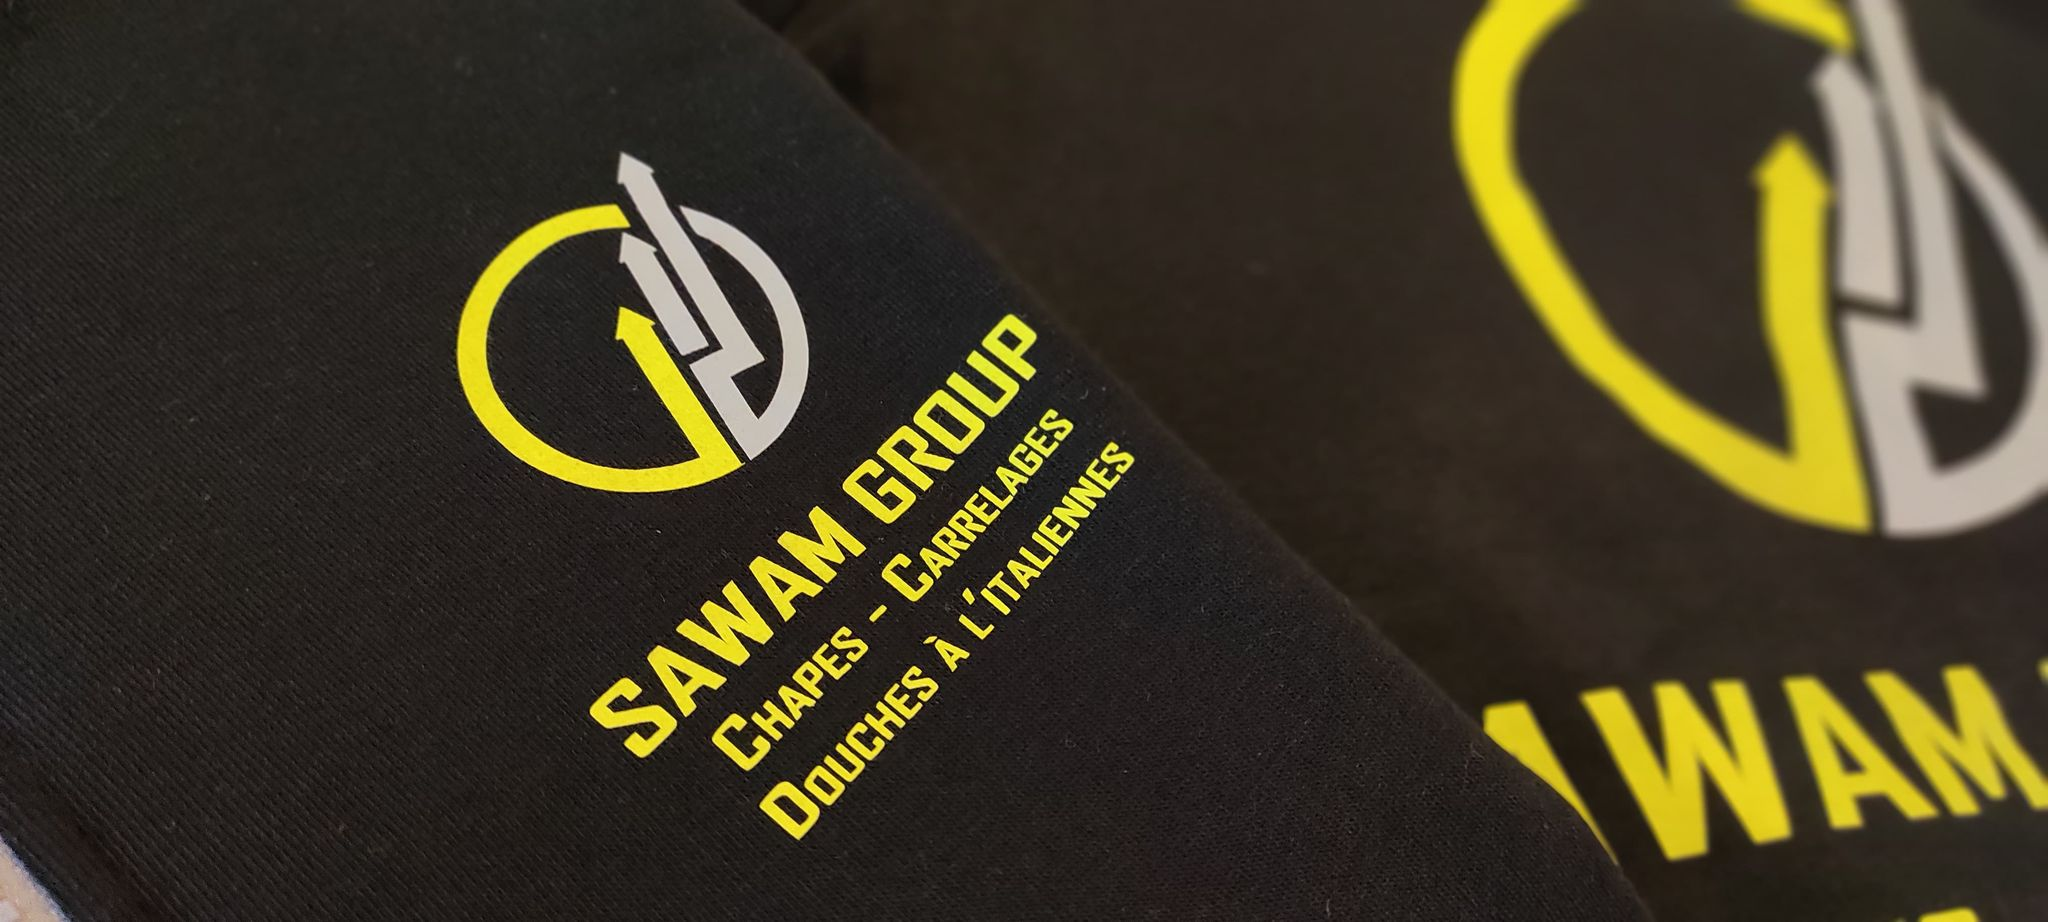 Sawam Group